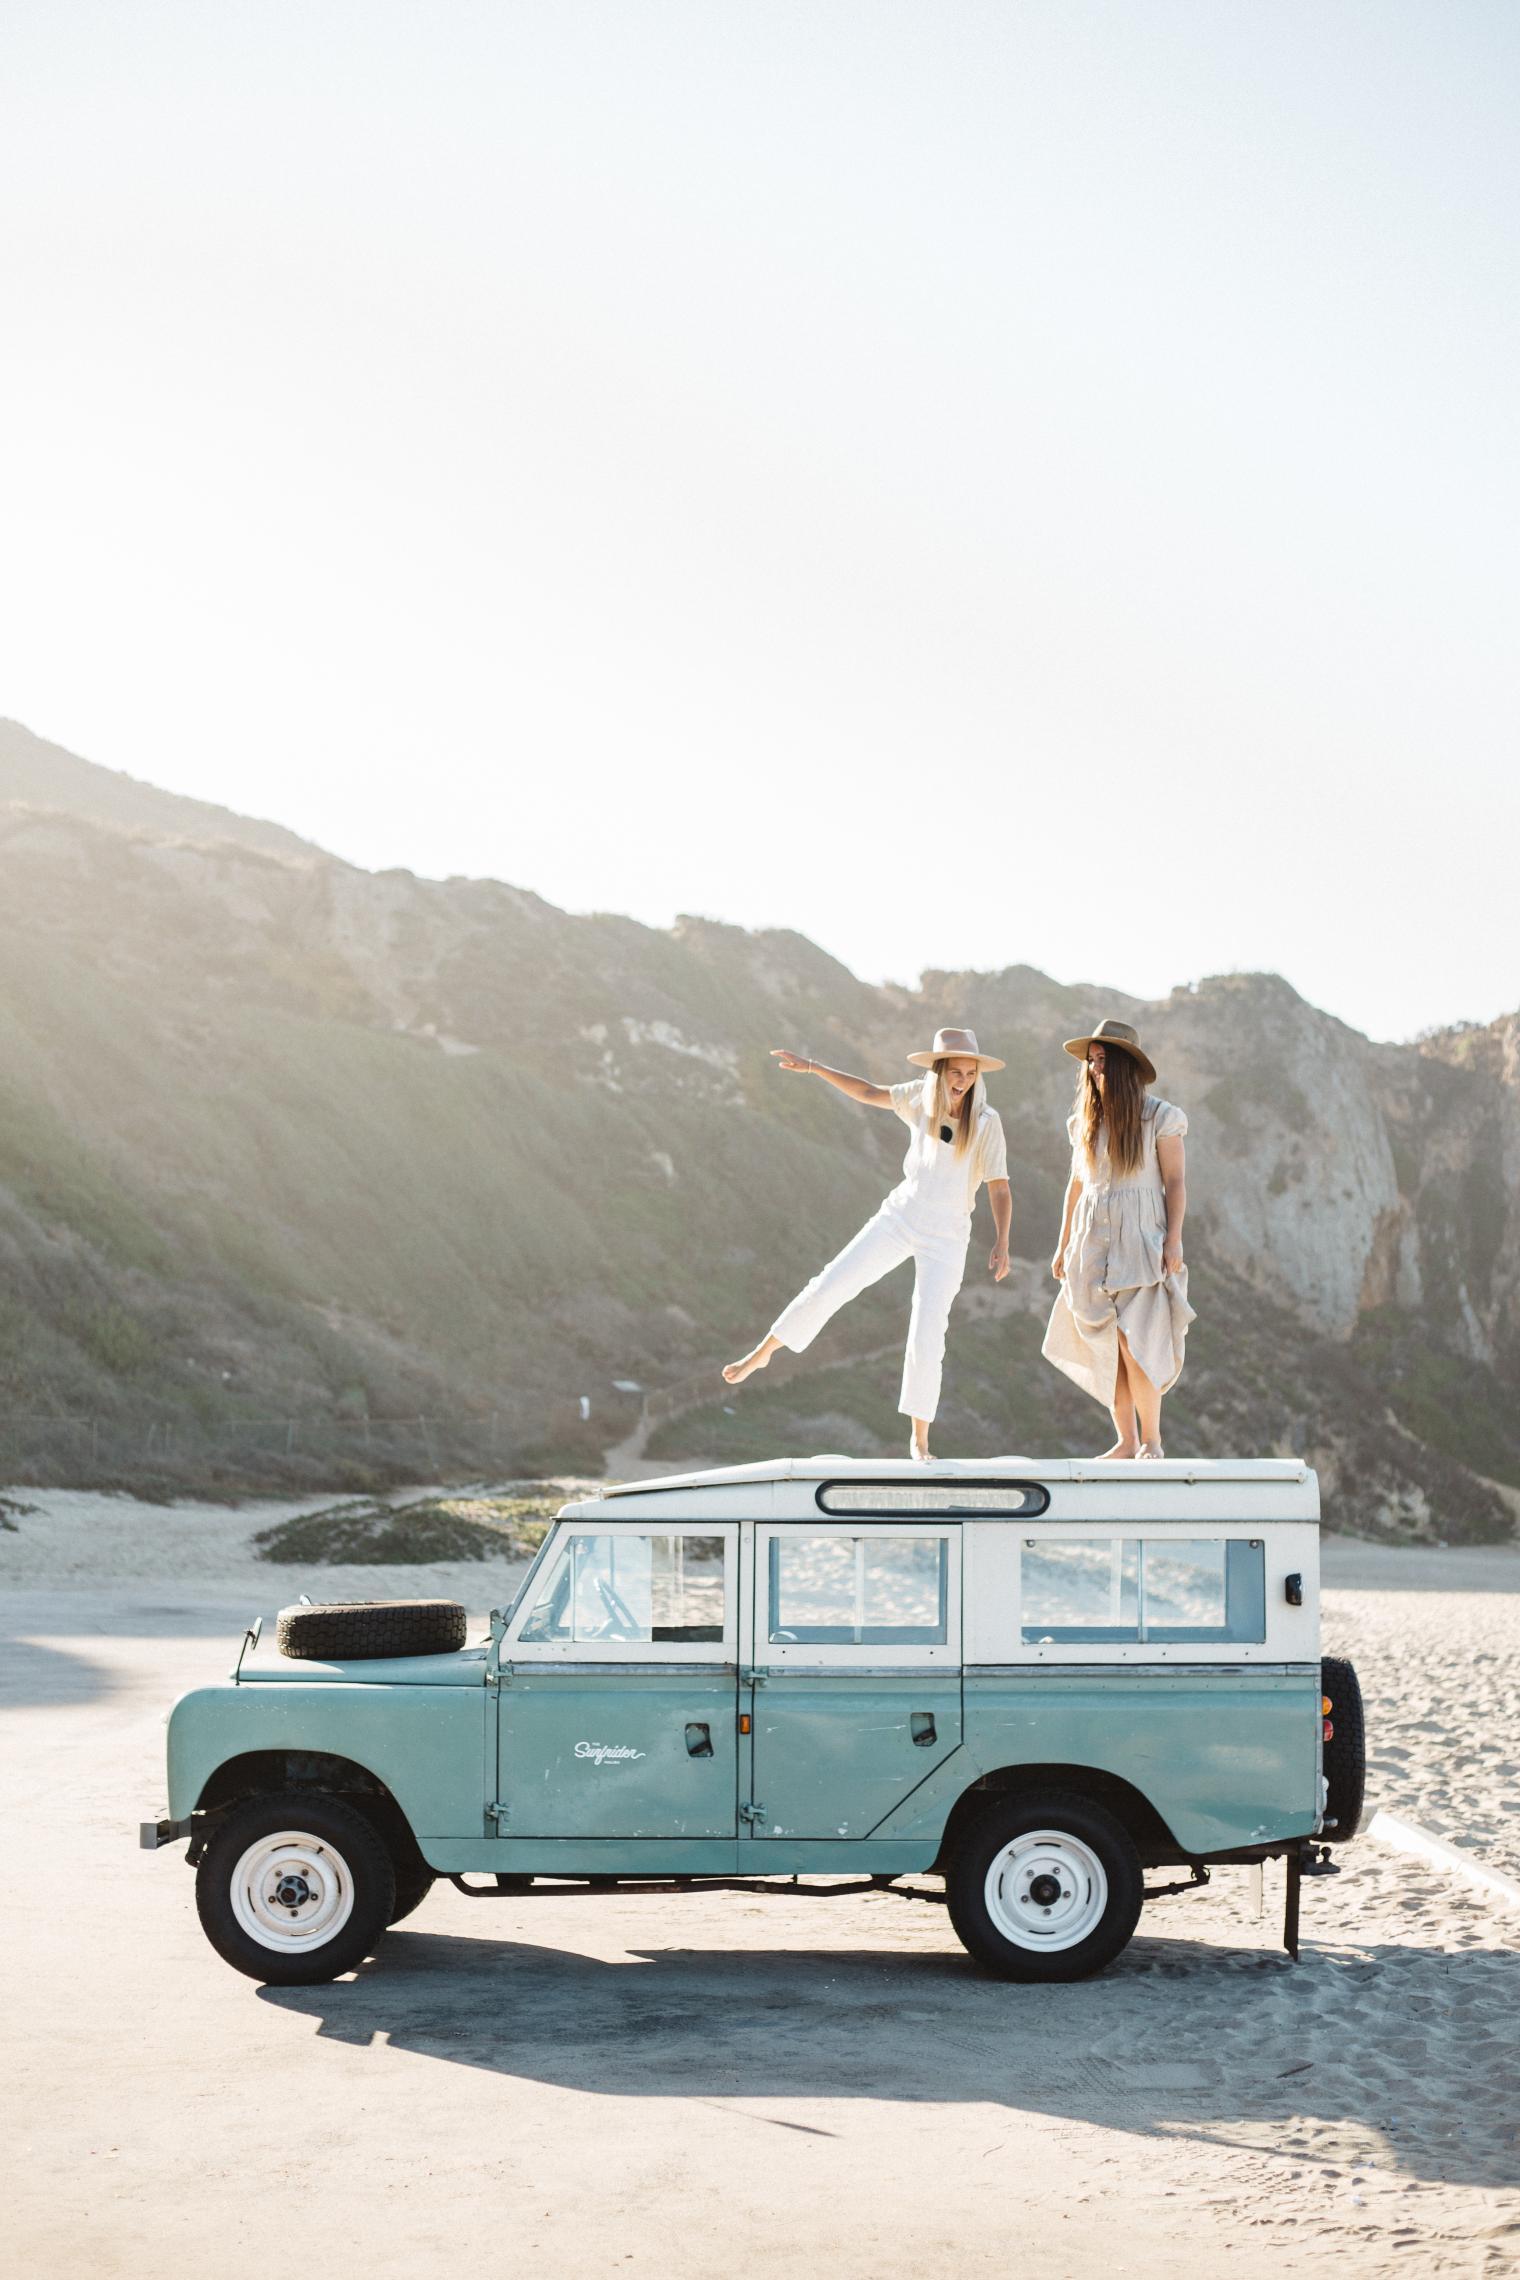 7 Cool California Girls Getaways